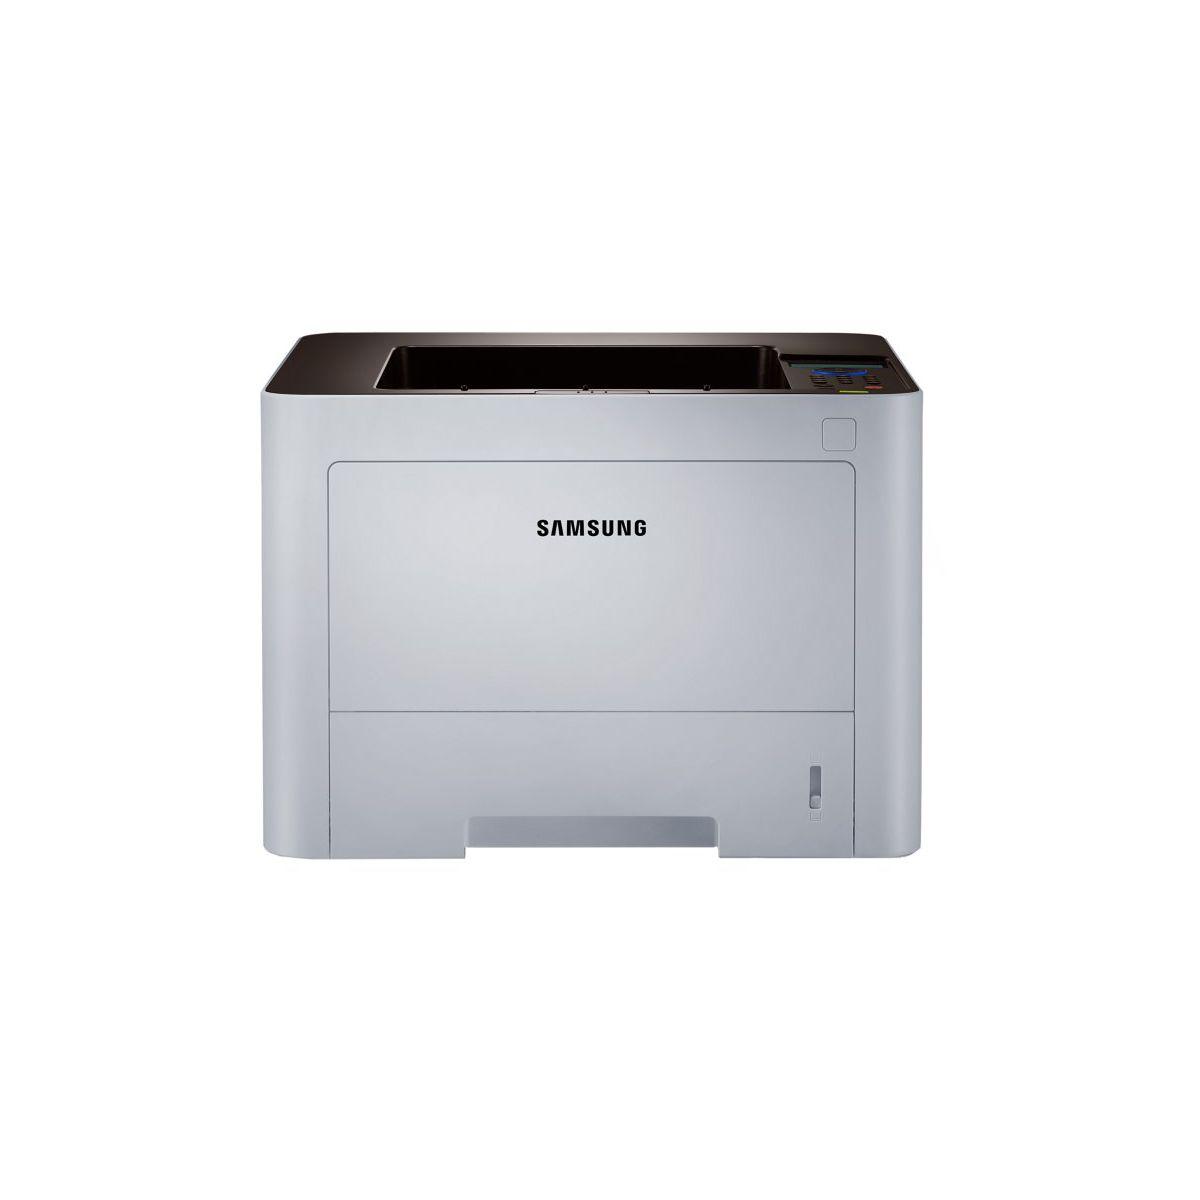 Imprimante monofonction laser monochrome SAMSUNG SL-M3820ND (photo)